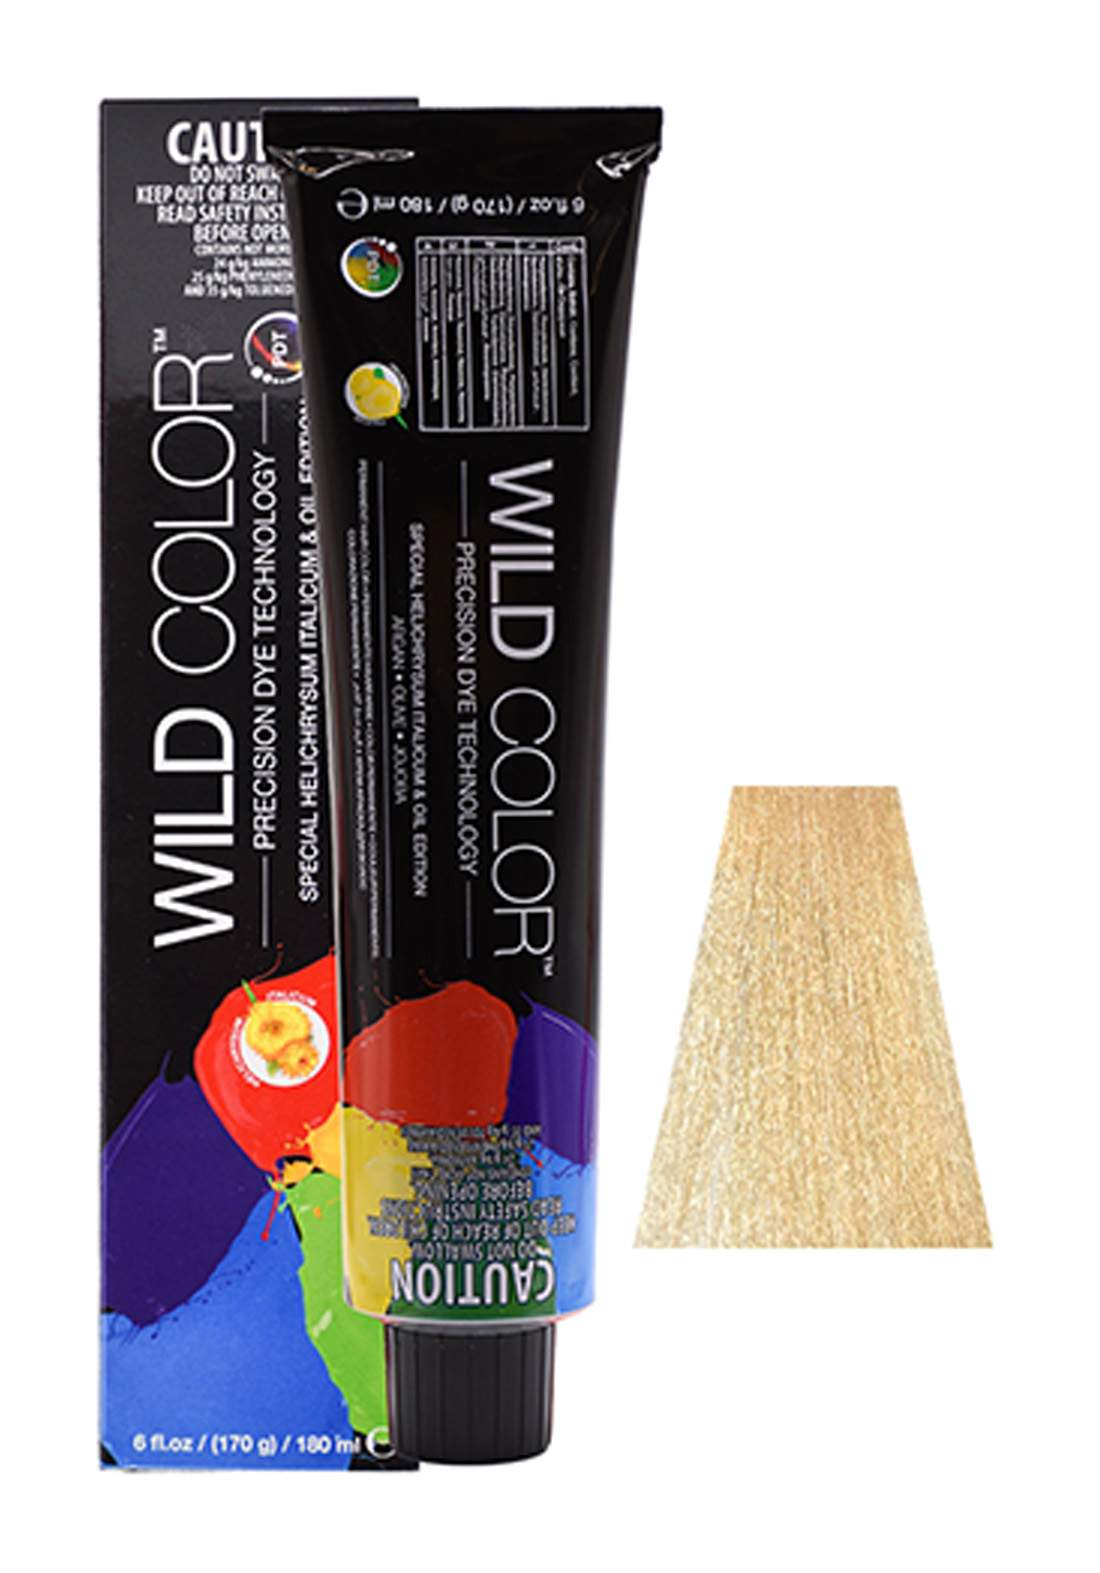 Wild Color Hair Color Cream 9.3 9G -Very Light Golden  Blond صبغة شعر